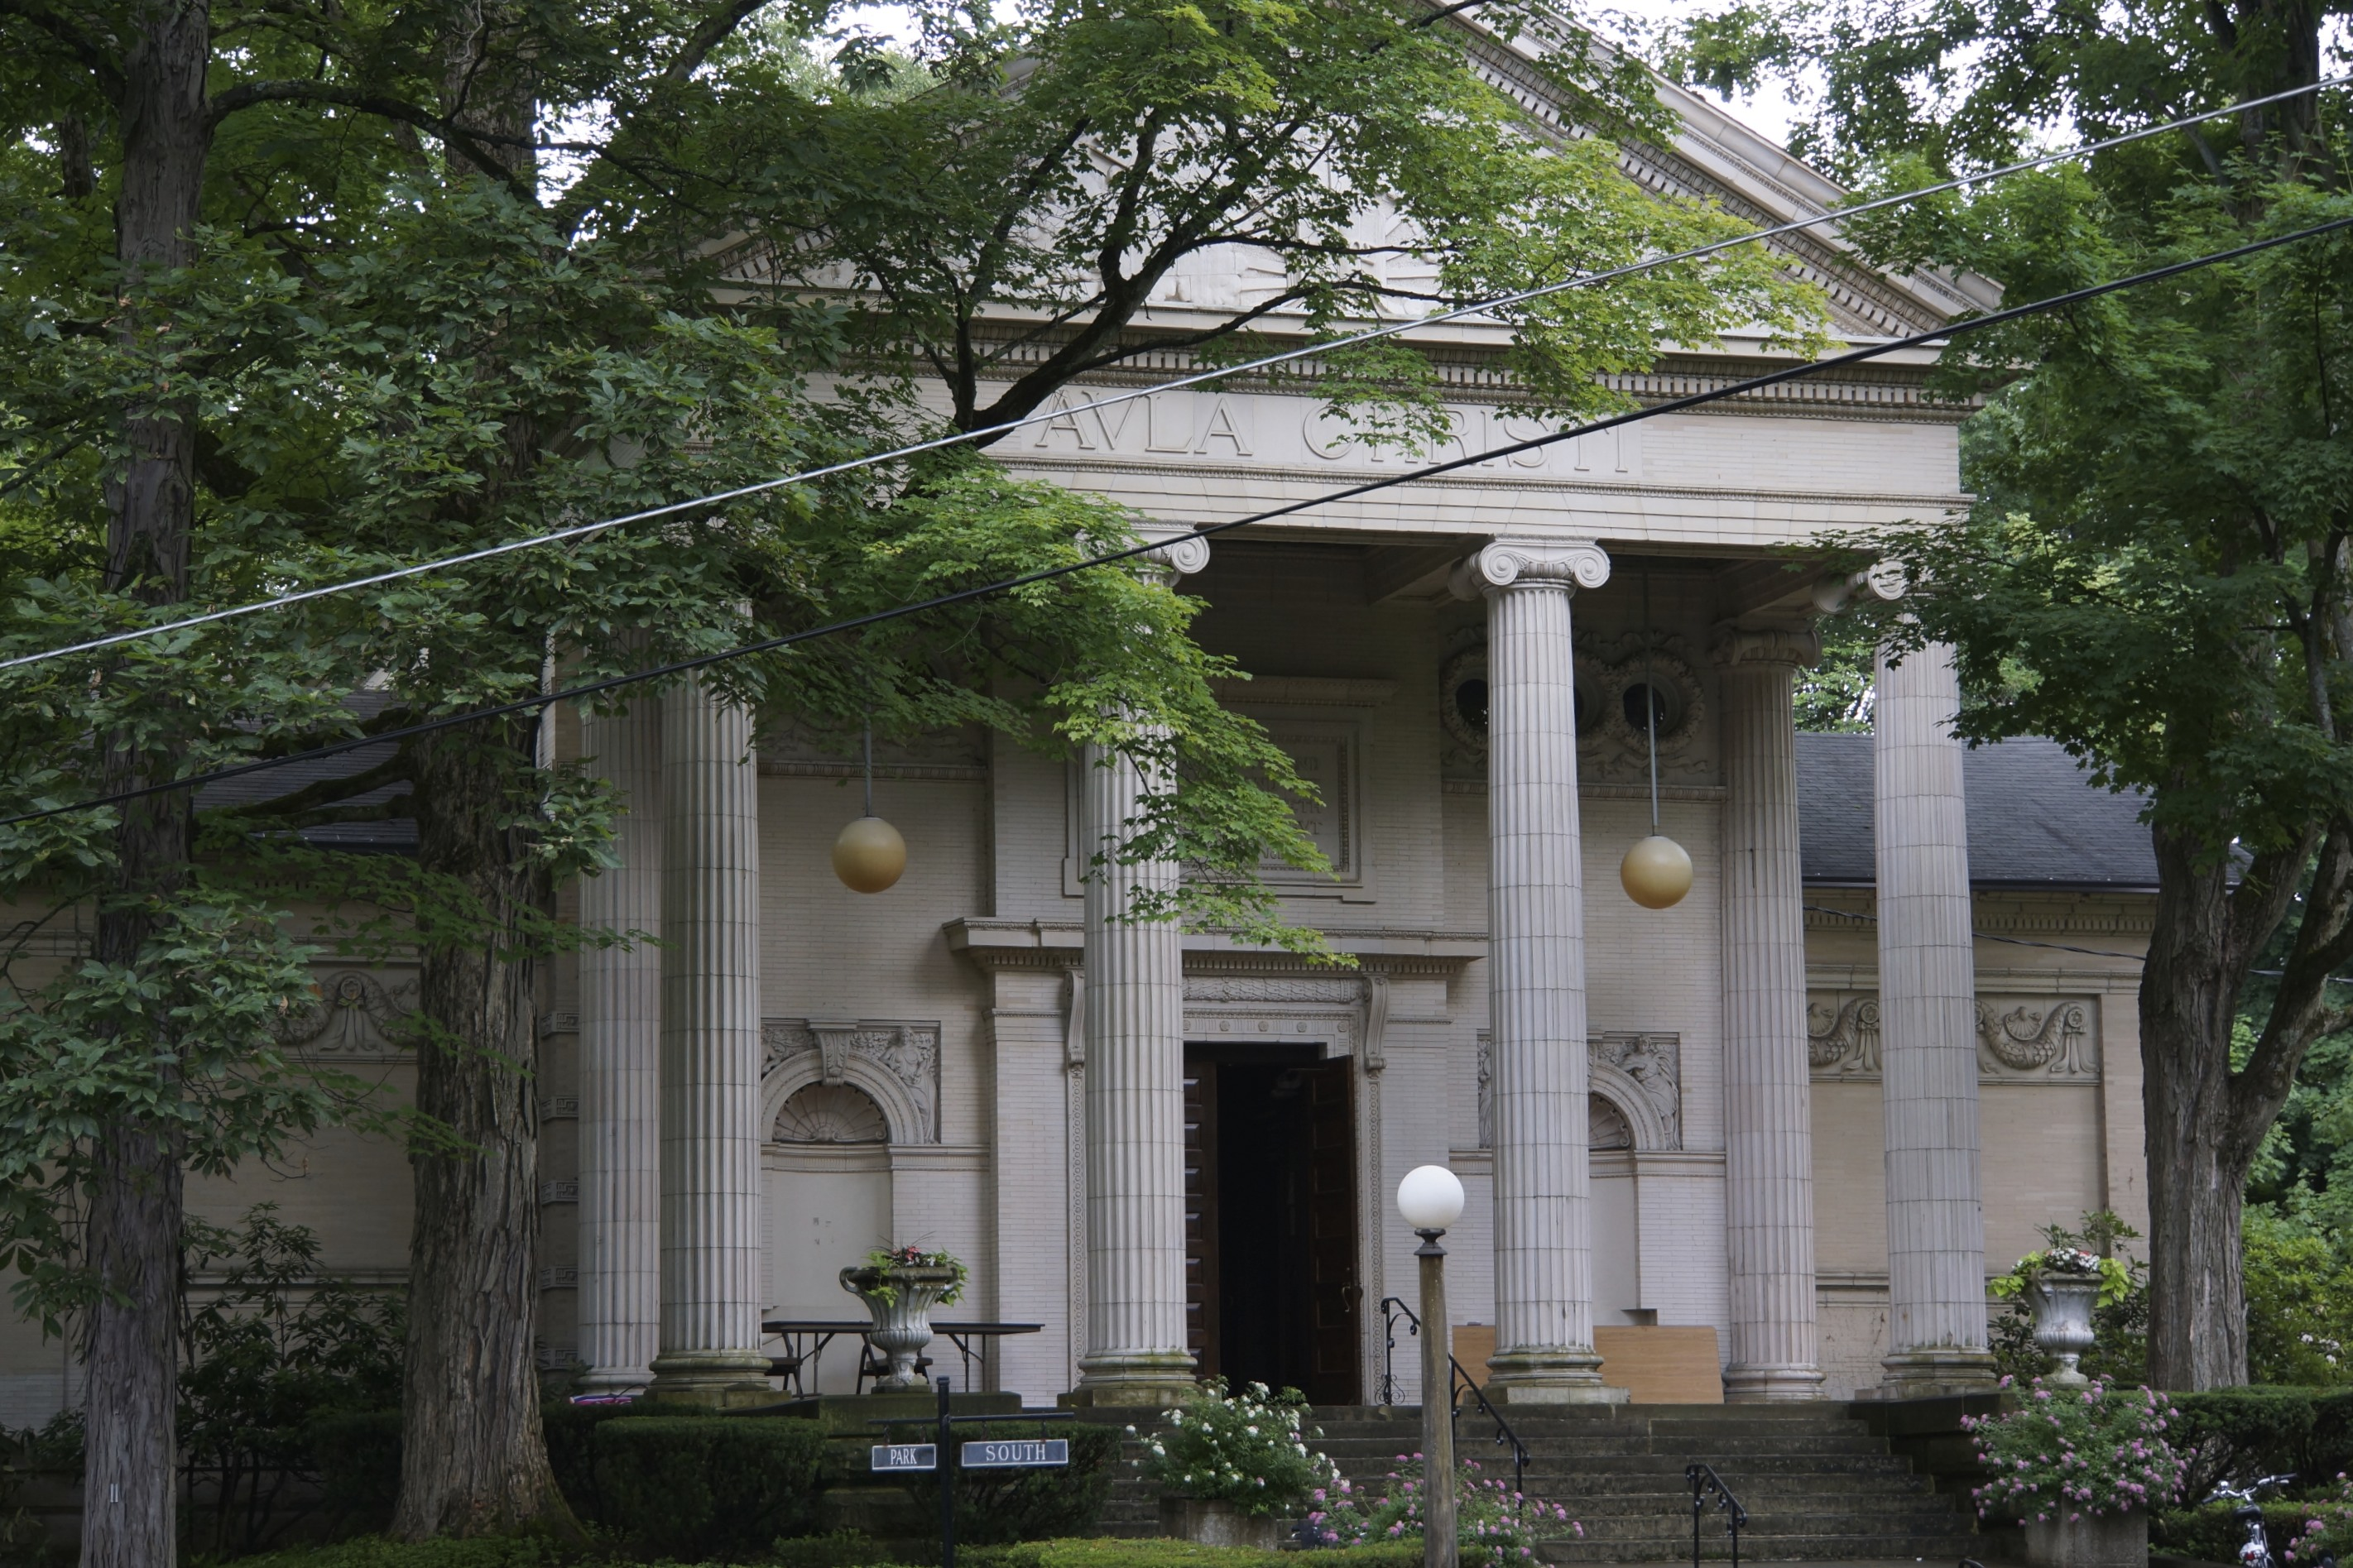 Chautauqua Literary Club